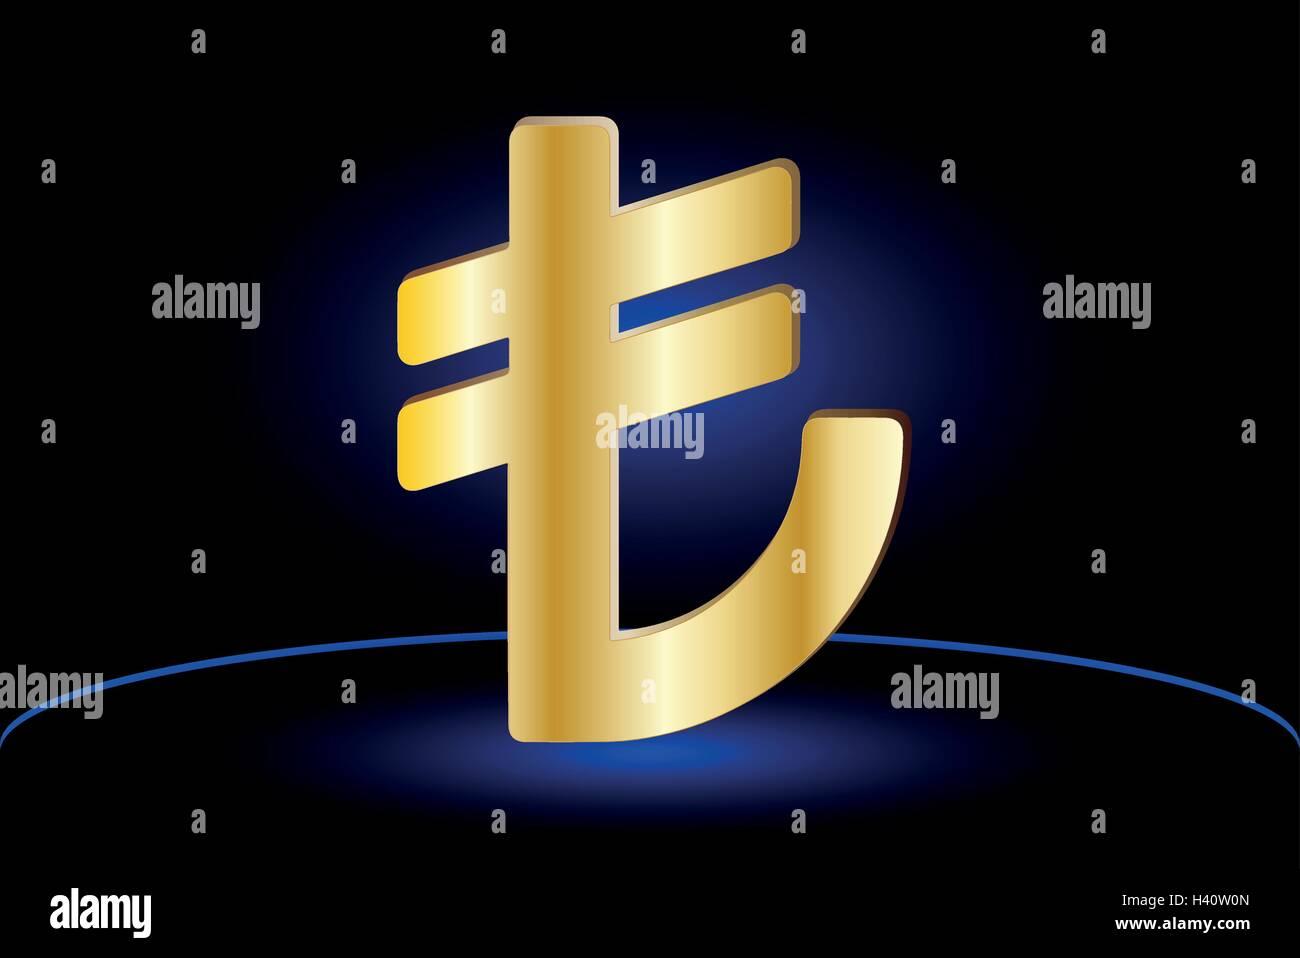 Turkish lira symbol turkish lira icon stock vector art turkish lira symbol turkish lira icon buycottarizona